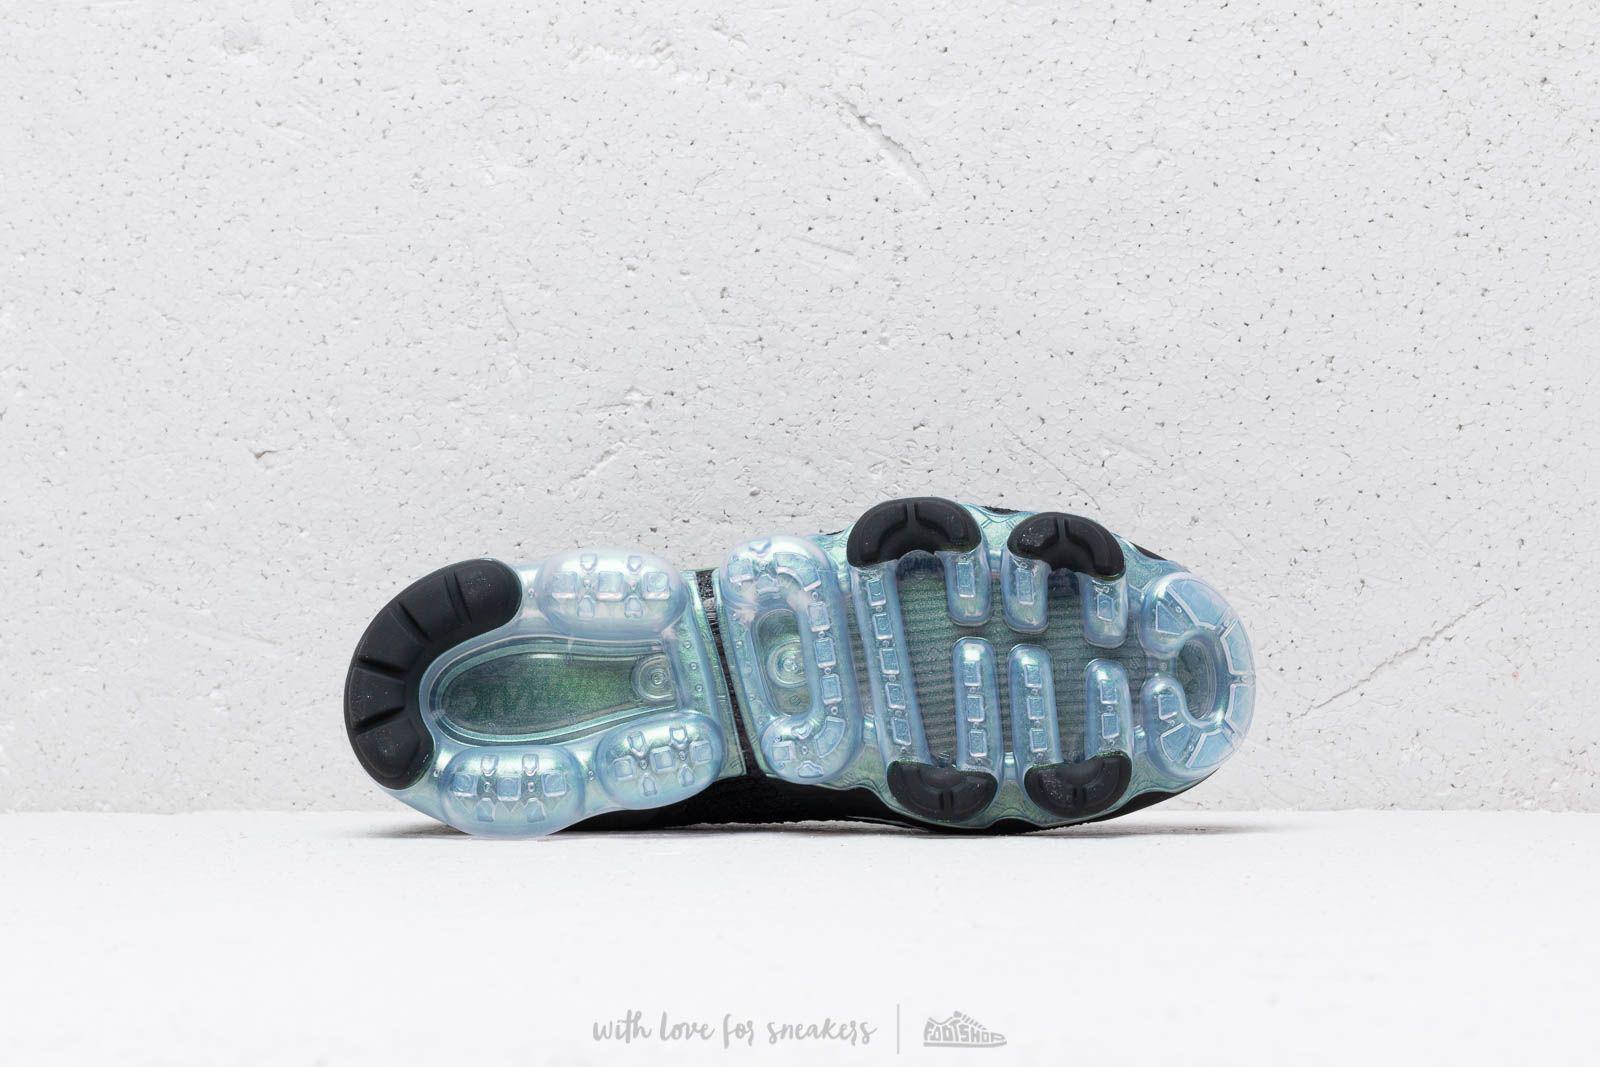 d2799a935417 Lyst - Nike Air Vapormax Flyknit 2 Black  Multi-color-metallic ...